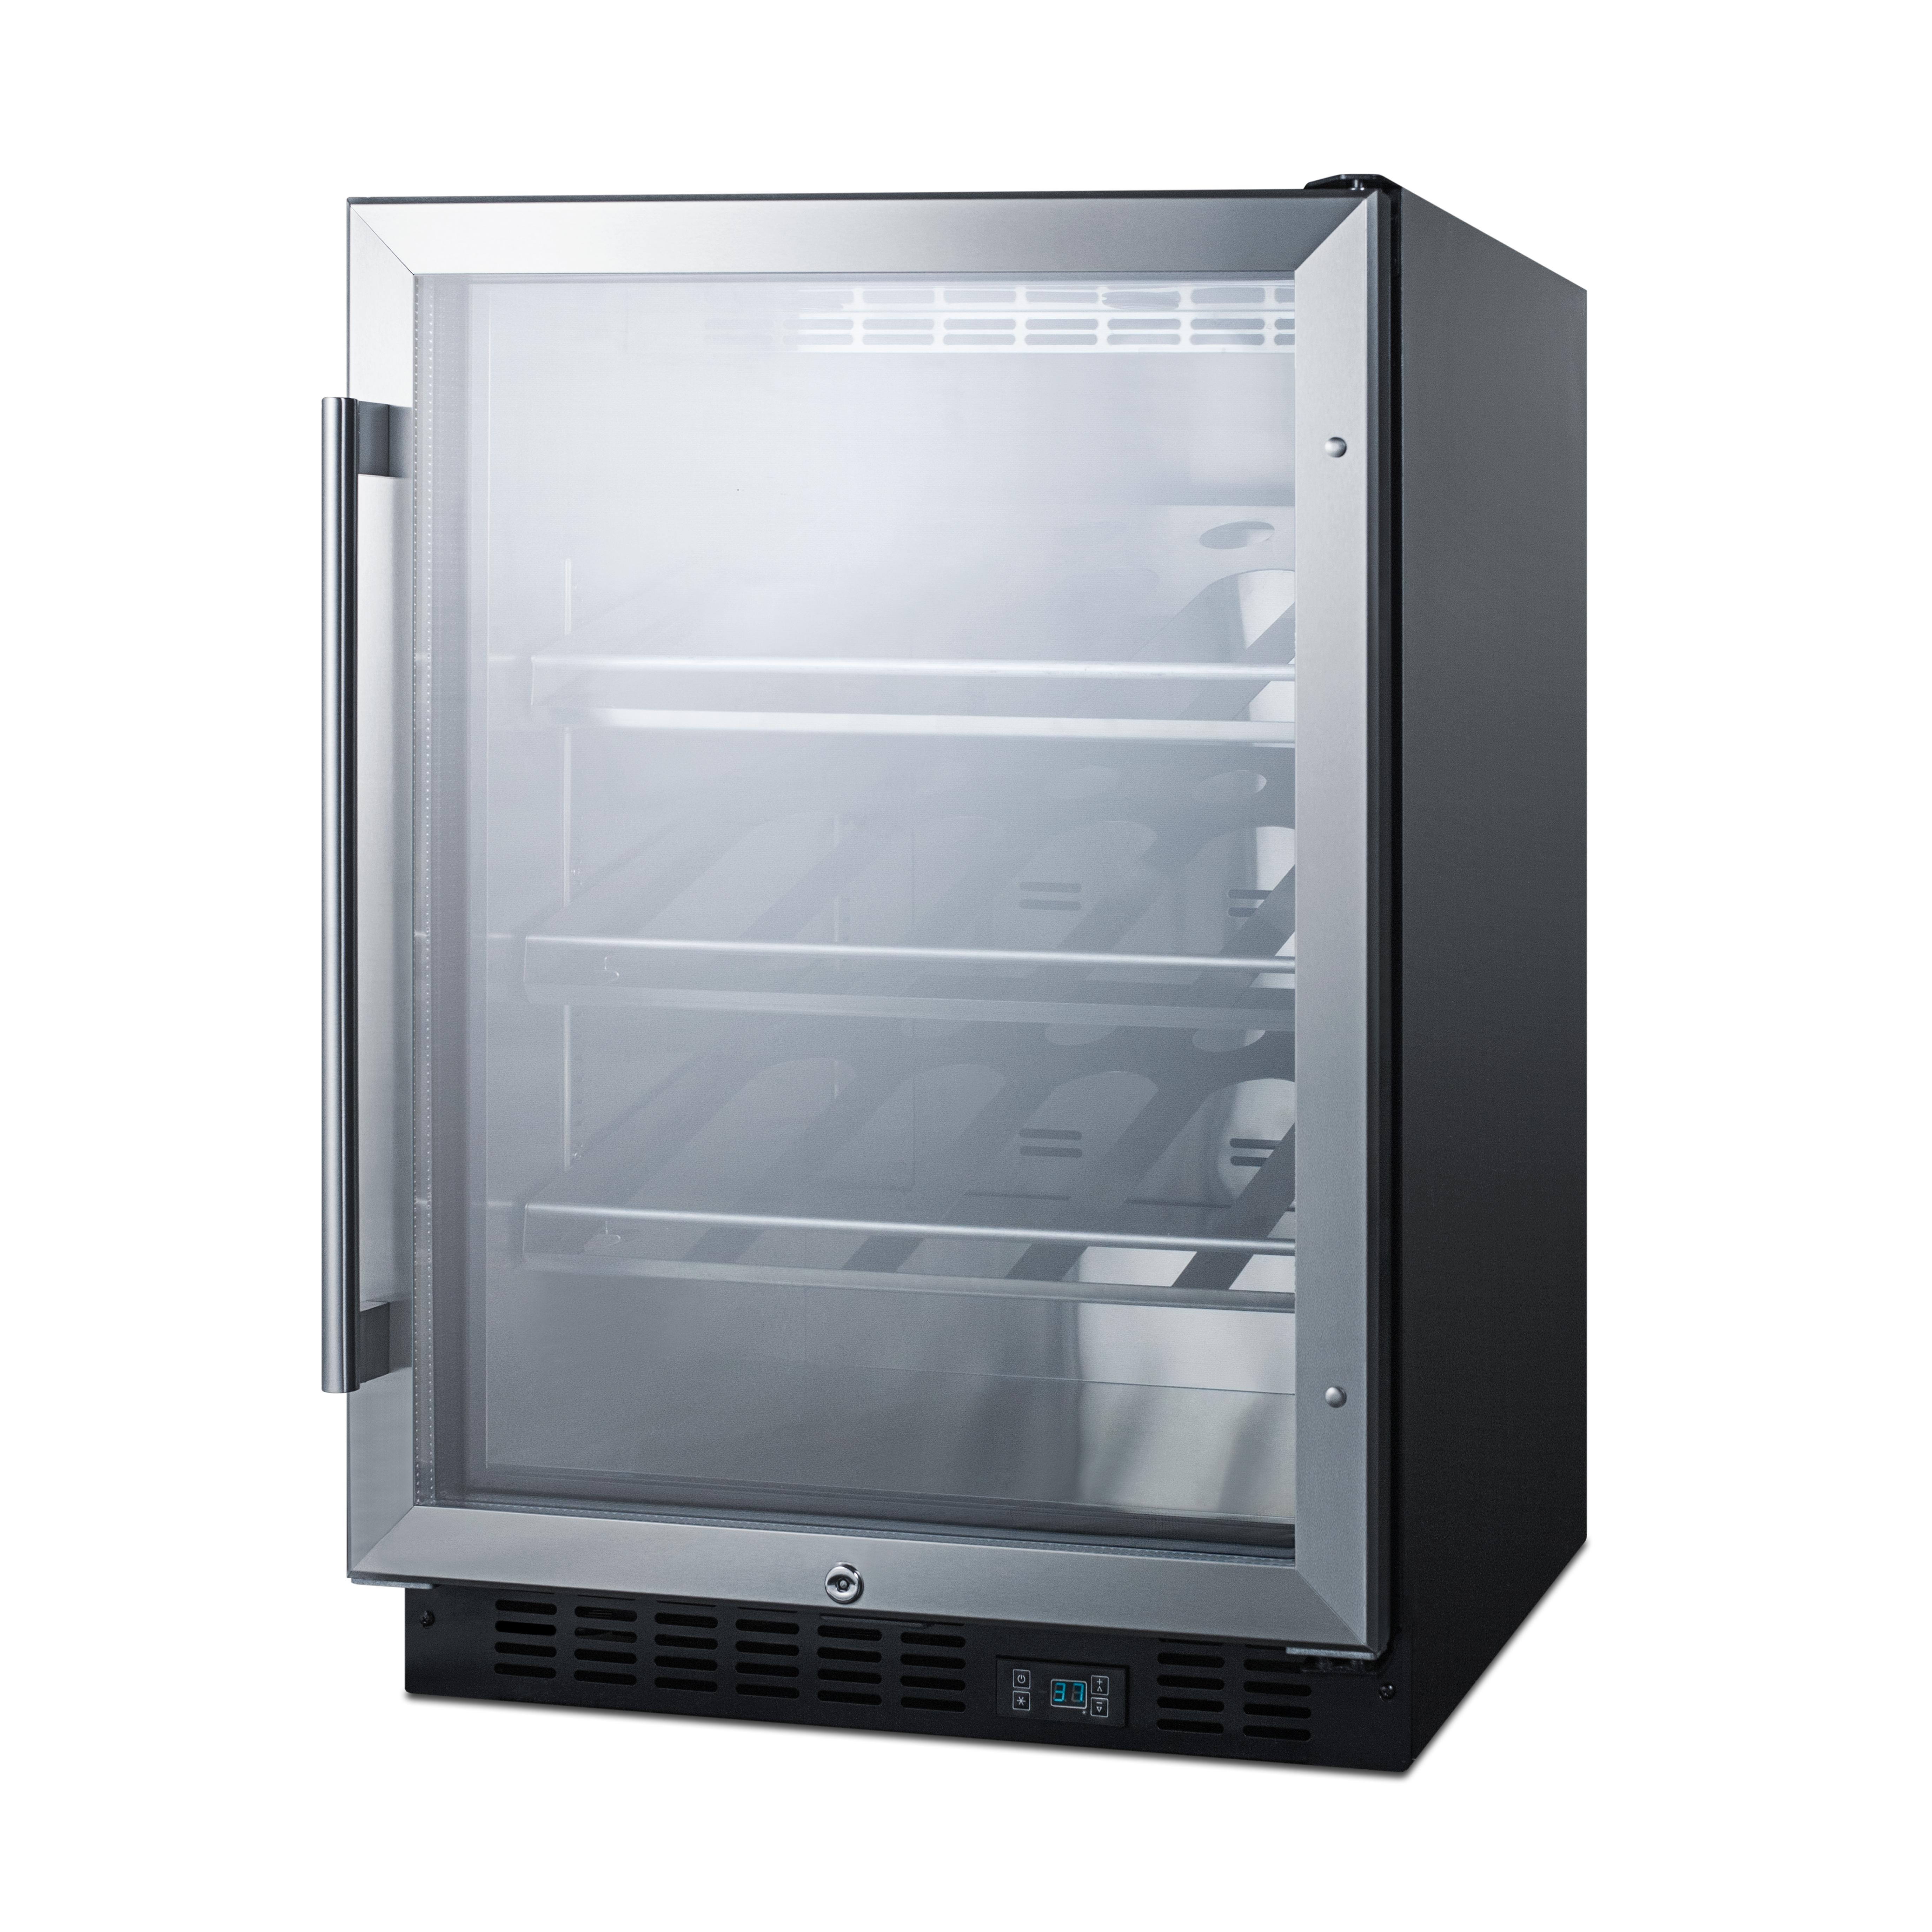 Summit Appliance SCR610BLCH wine cellar cabinet